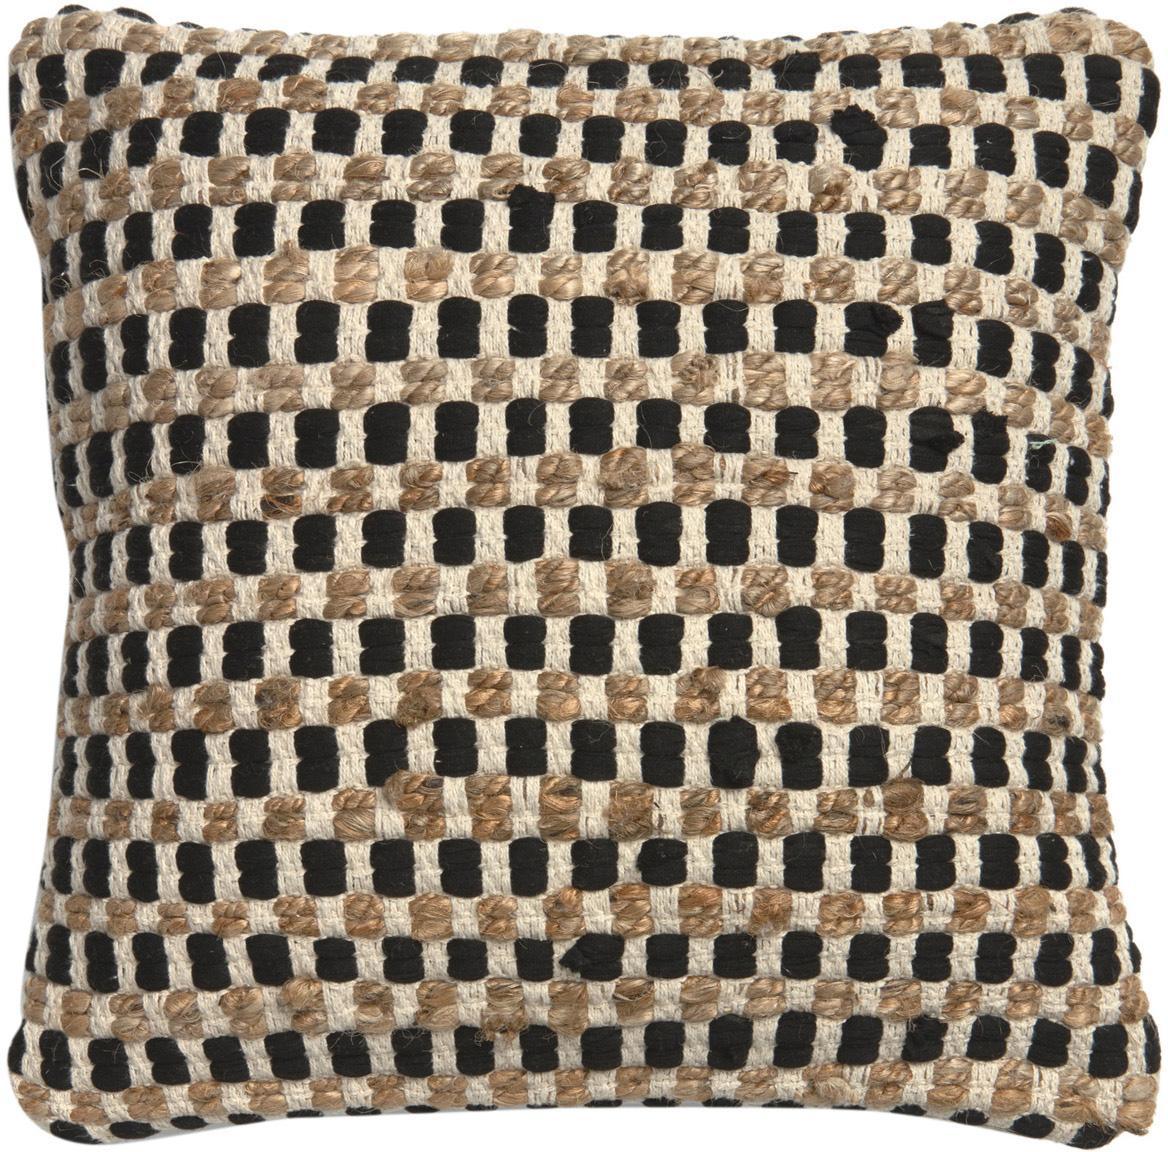 Kissenhülle Fiesta aus Baumwolle/Jute, Vorderseite: 55% Chindi Baumwolle, 45%, Rückseite: 100% Baumwolle, Schwarz, Beige, 45 x 45 cm